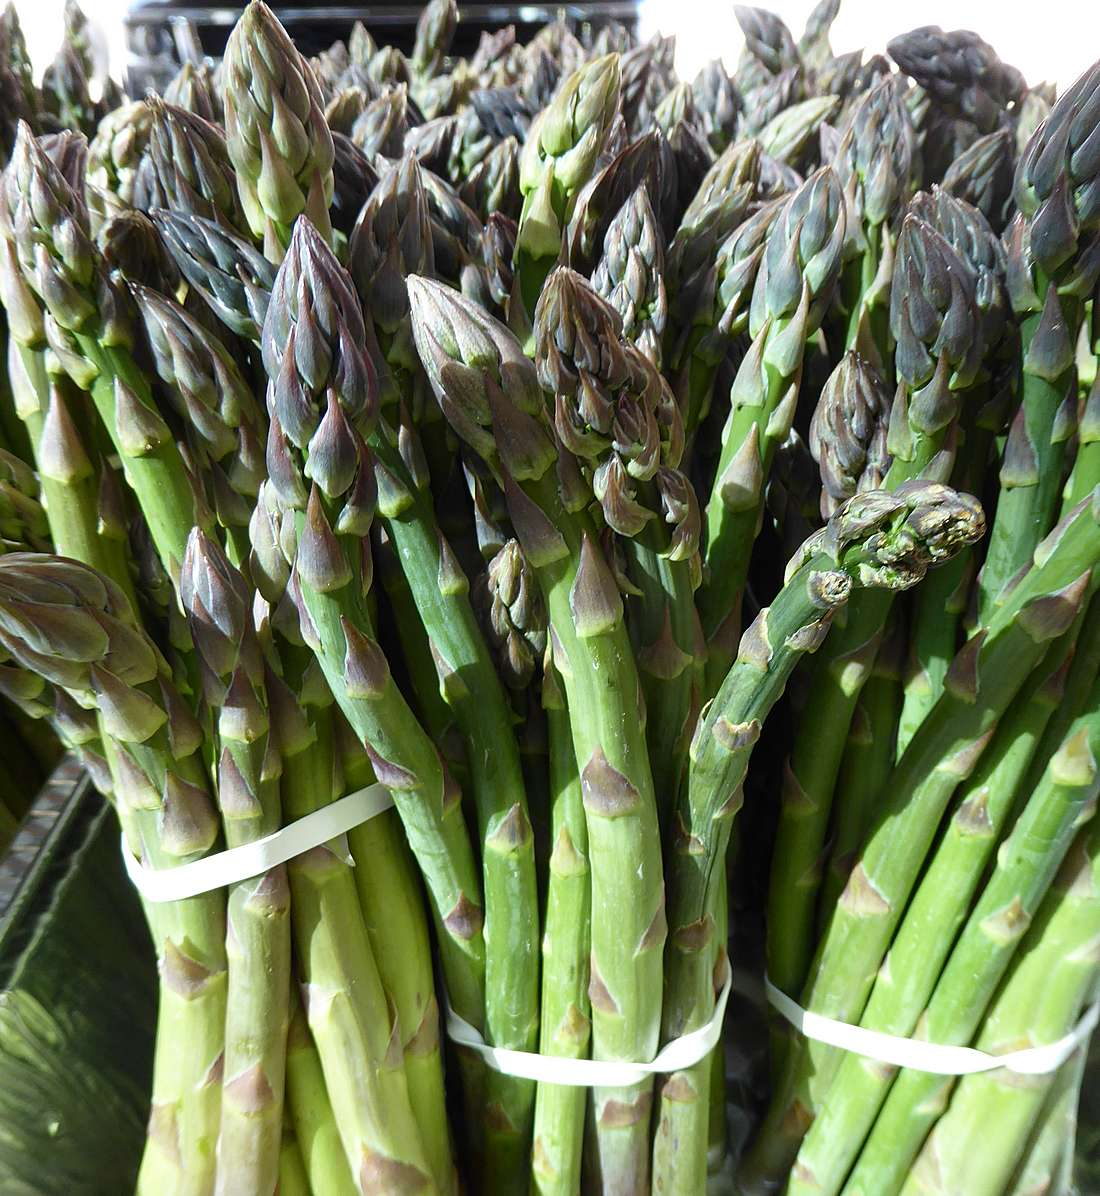 asparagus at market